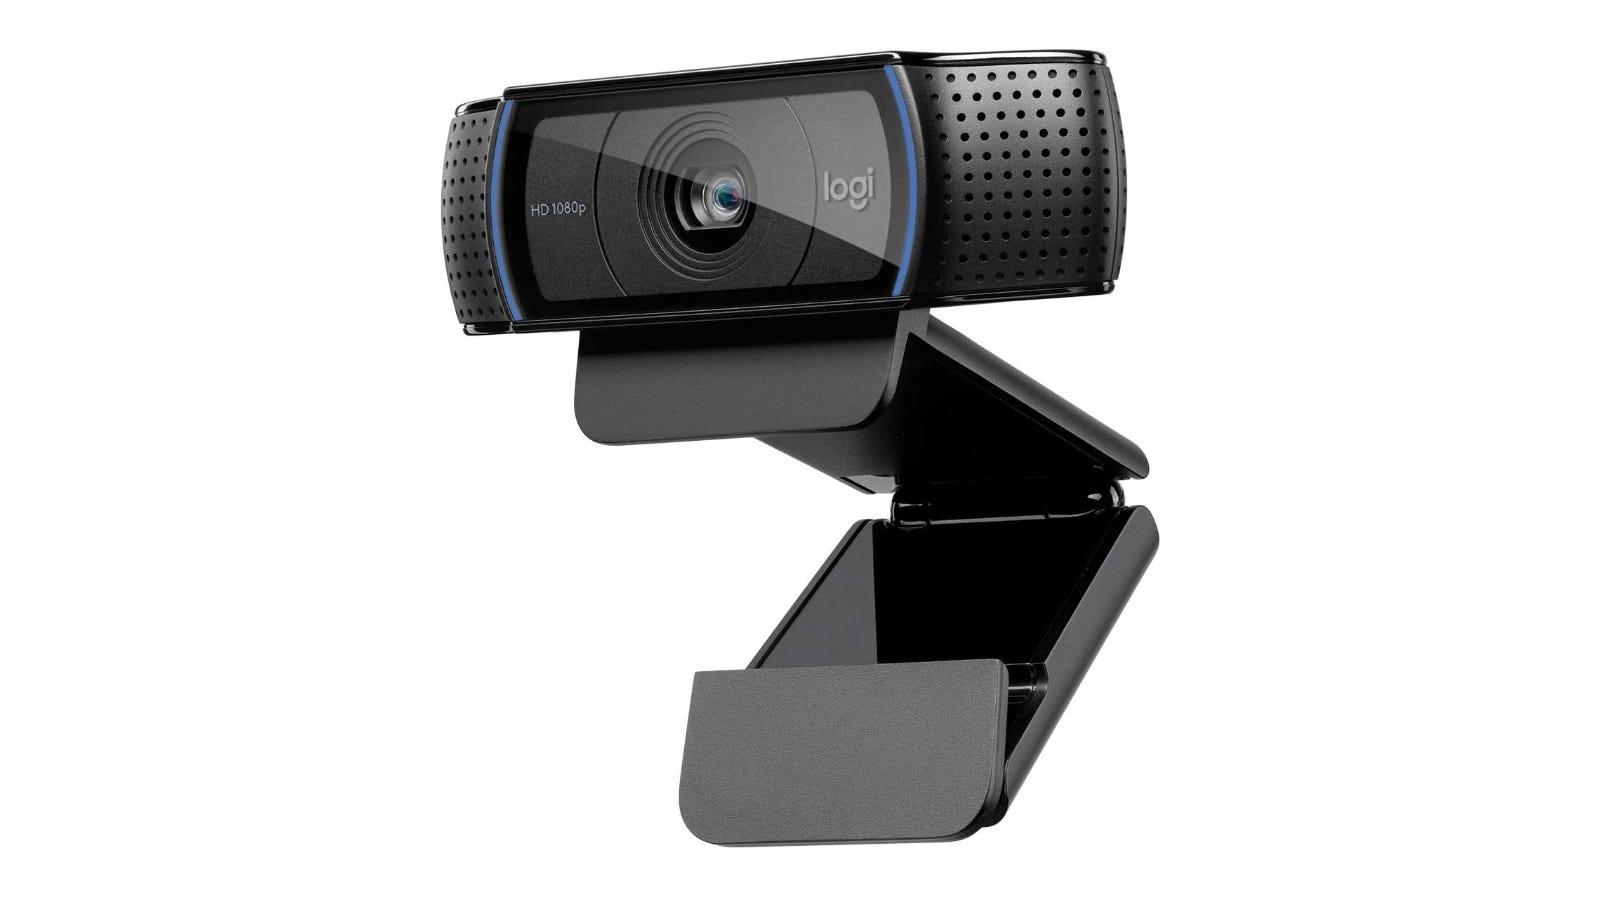 Logitech C920x webcam